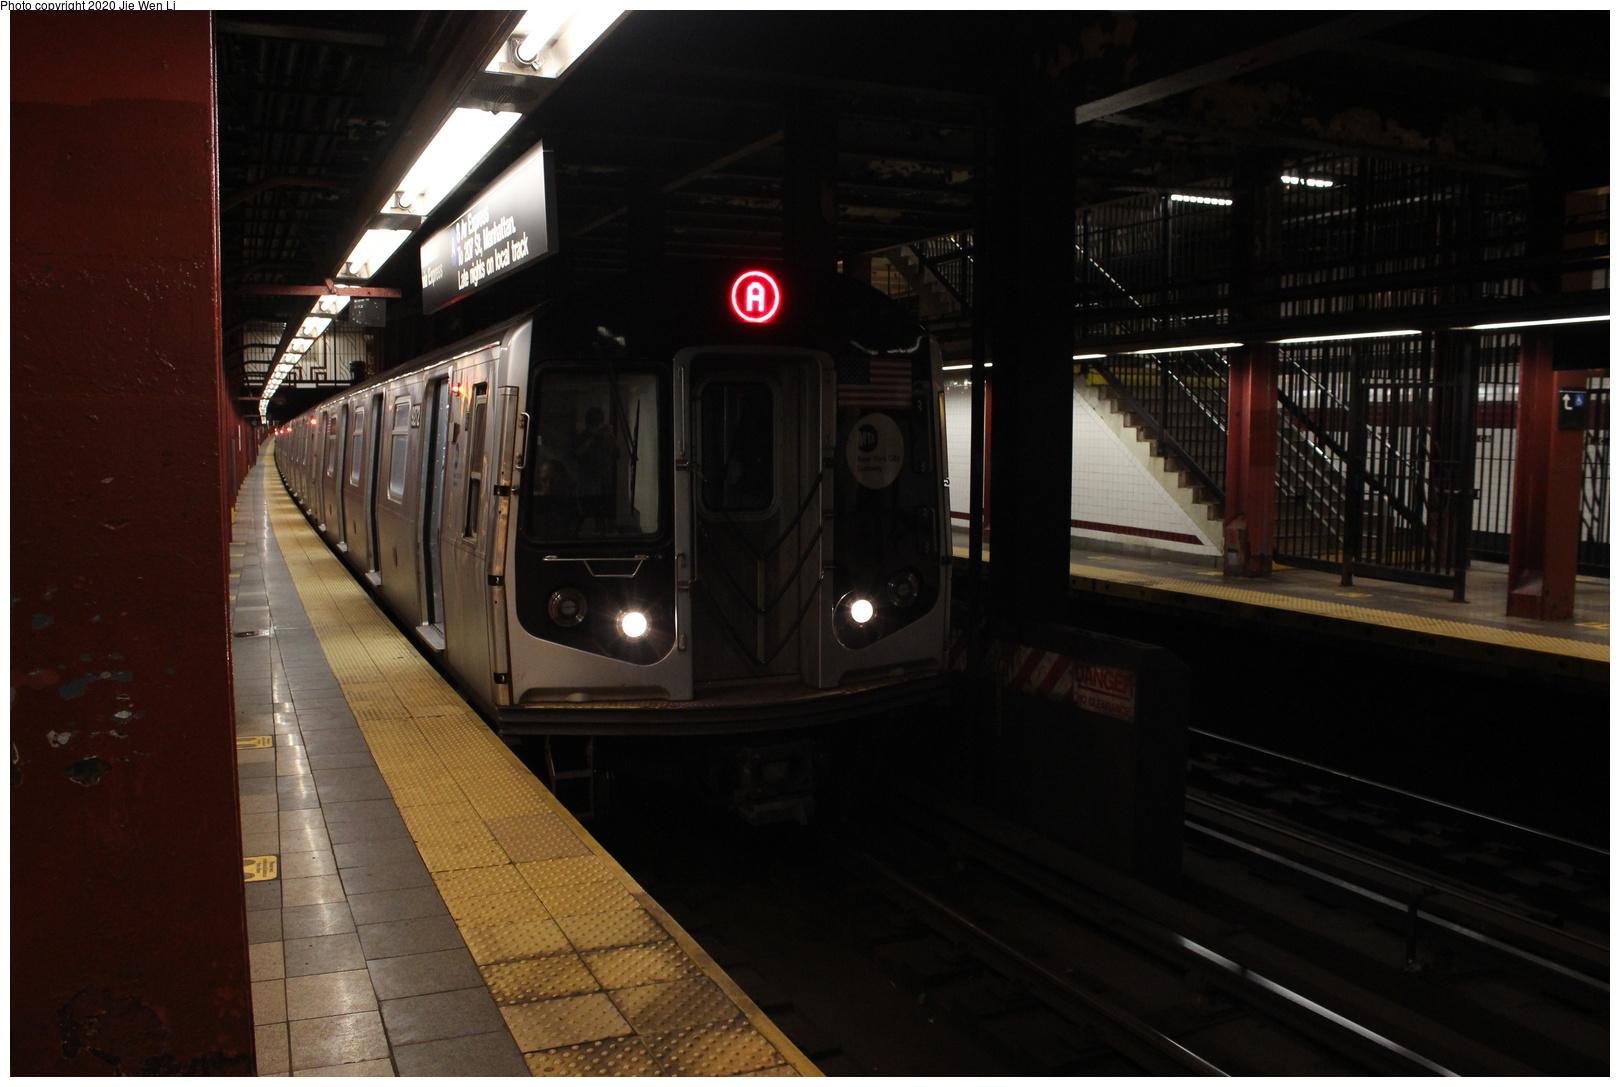 (221k, 1044x1041)<br><b>Country:</b> United States<br><b>City:</b> New York<br><b>System:</b> New York City Transit<br><b>Line:</b> BMT Canarsie Line<br><b>Location:</b> Rockaway Parkway <br><b>Route:</b> BMT 16<br><b>Car:</b> R-10 (American Car & Foundry, 1948)  <br><b>Photo by:</b> Joel Shanus<br><b>Viewed (this week/total):</b> 1 / 2621